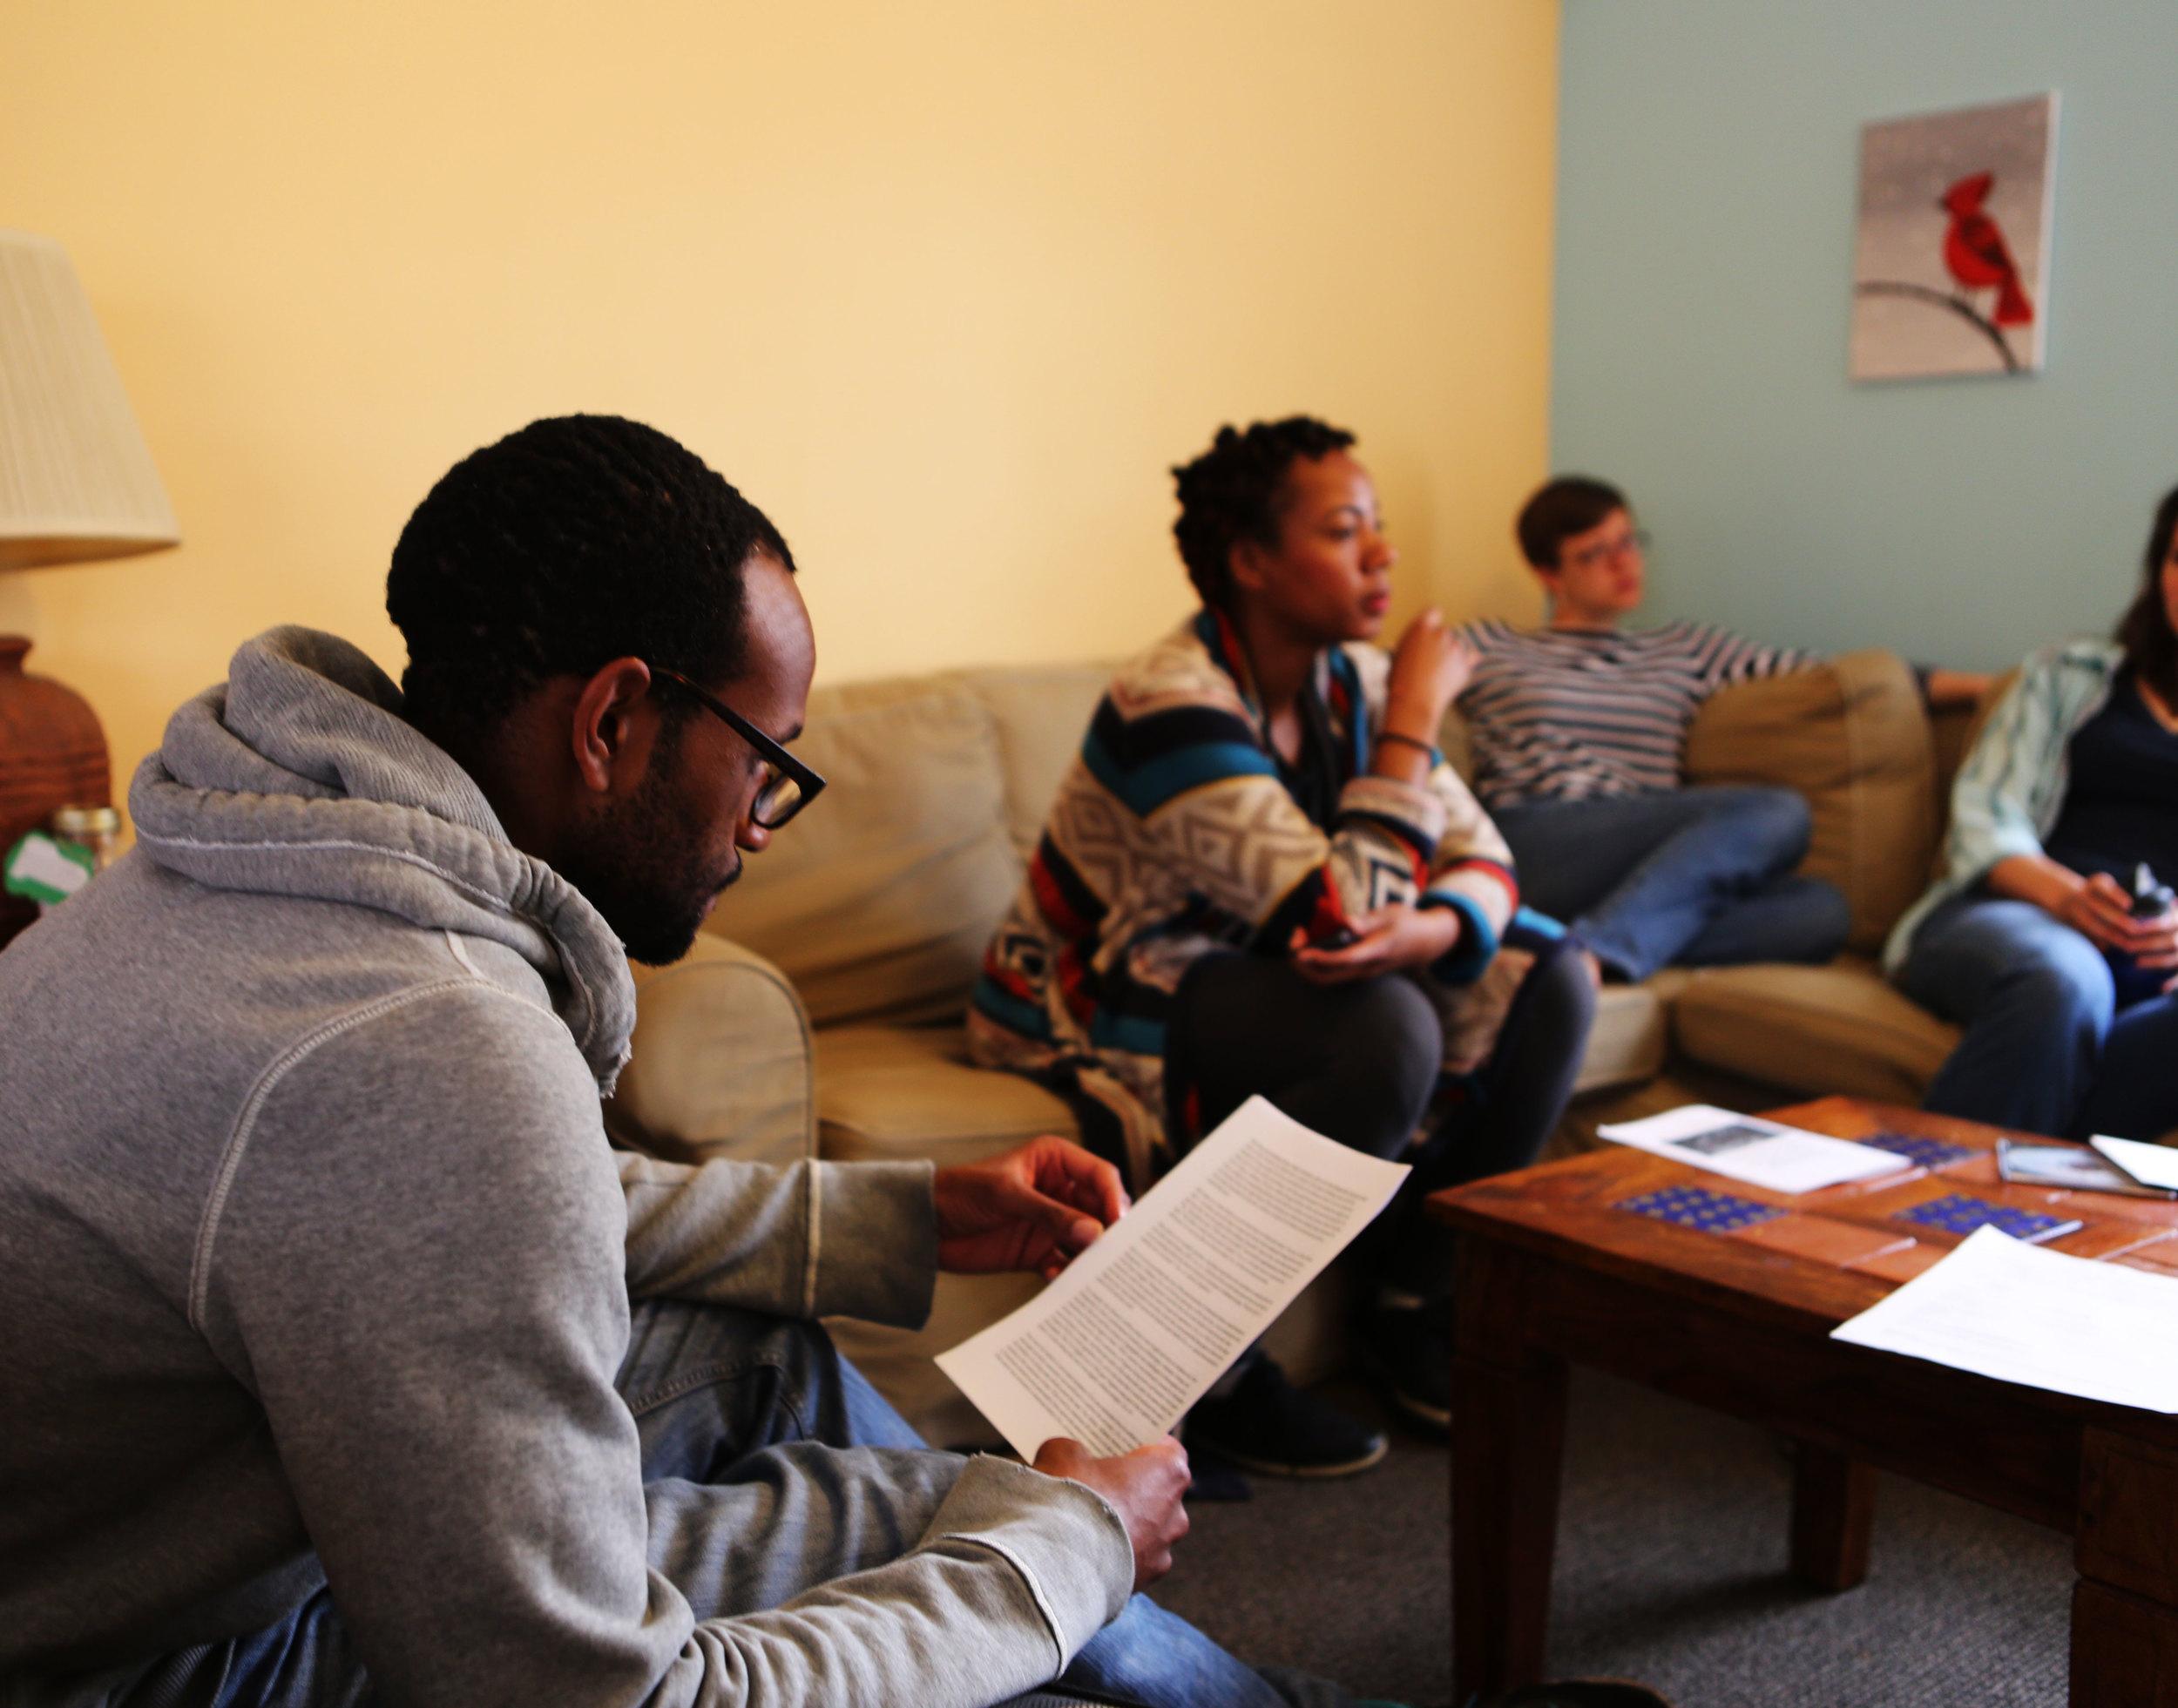 #Fridays The Road Fellows | The Road Episcopal Service Corps Atlanta | Photo credit: GreenGate-Marketing.com